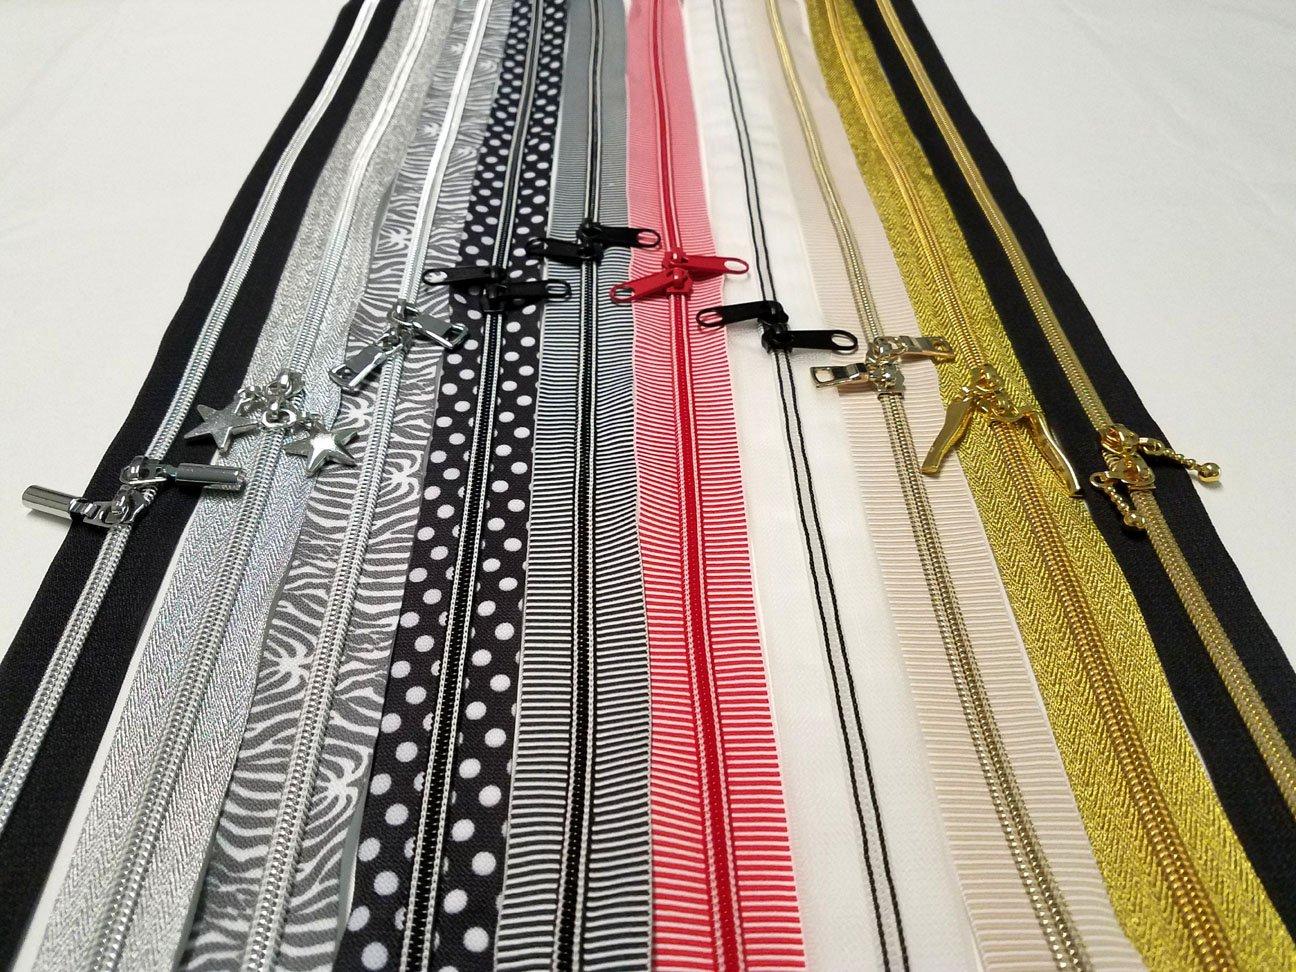 20 Closed Bottom Zipper - Tan/White Stripe